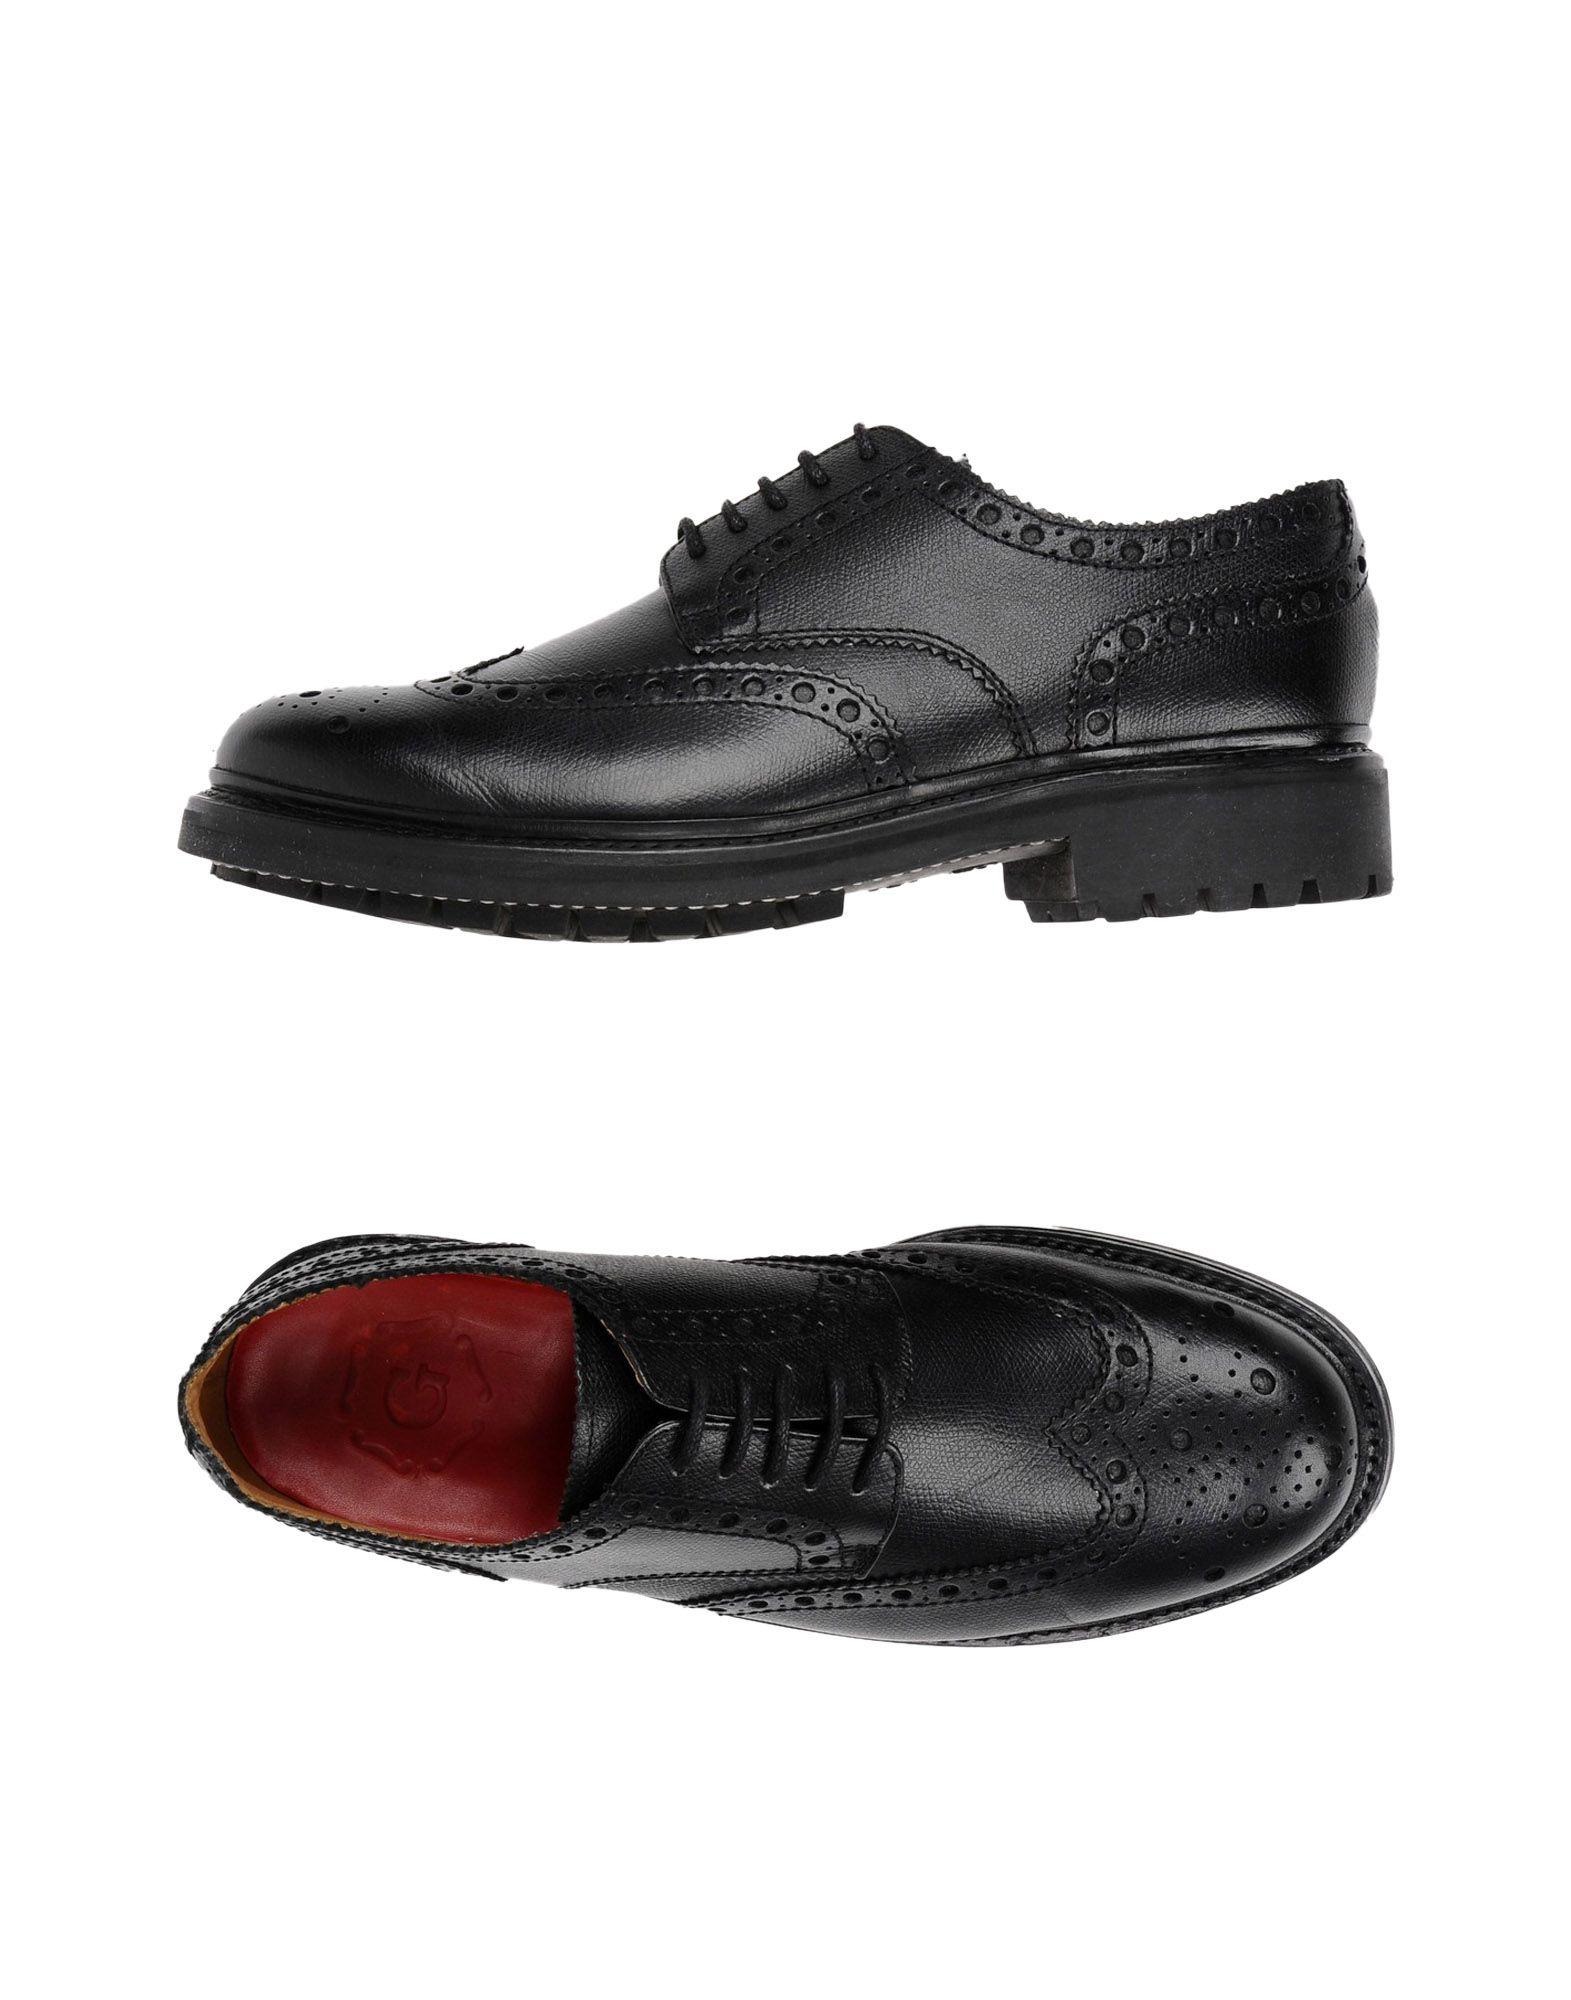 каталог обуви сандали иркутск каталог с ценами